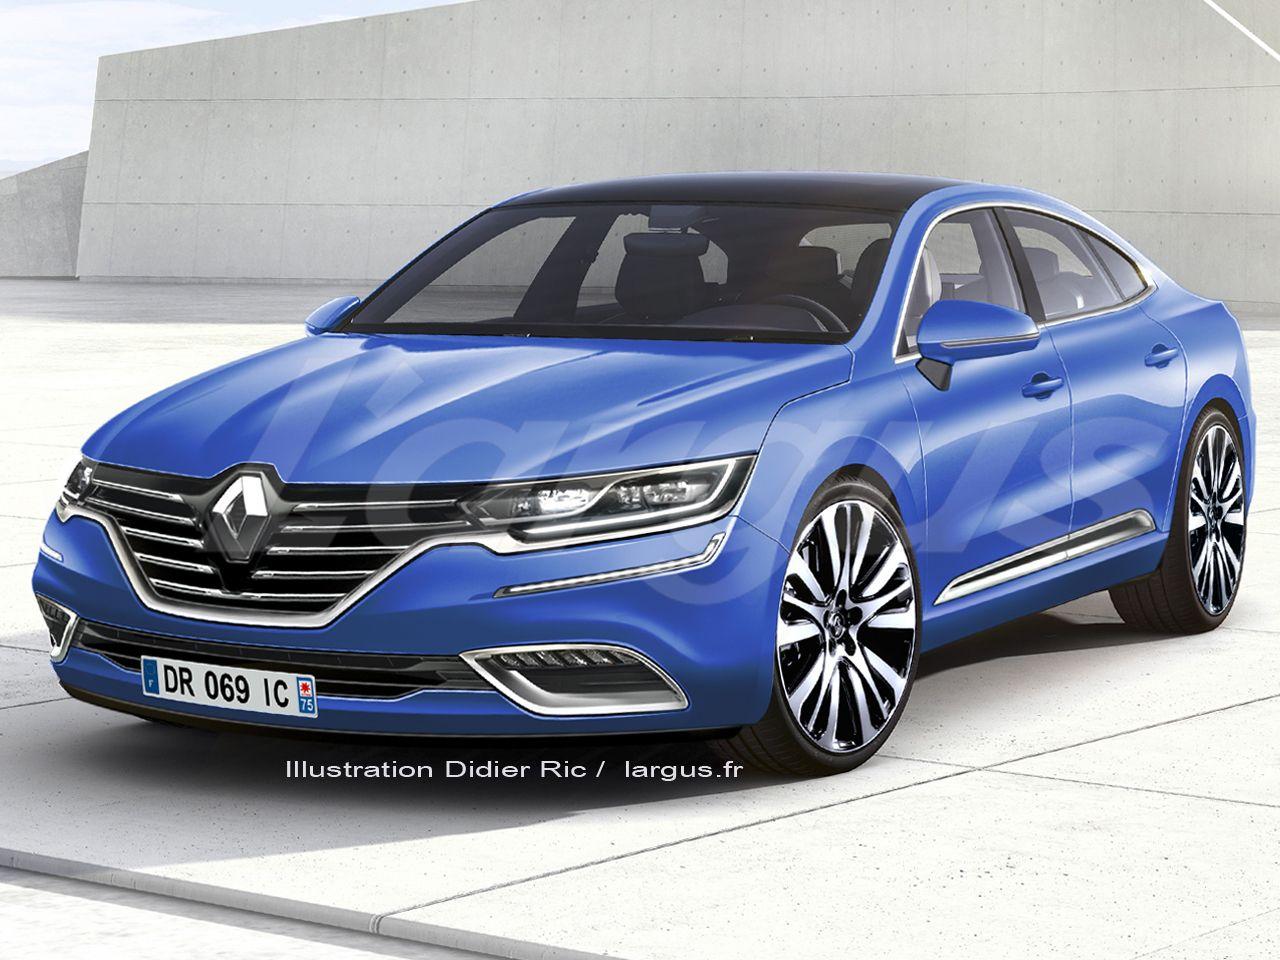 nouvelle renault 2018.  Nouvelle And Nouvelle Renault 2018